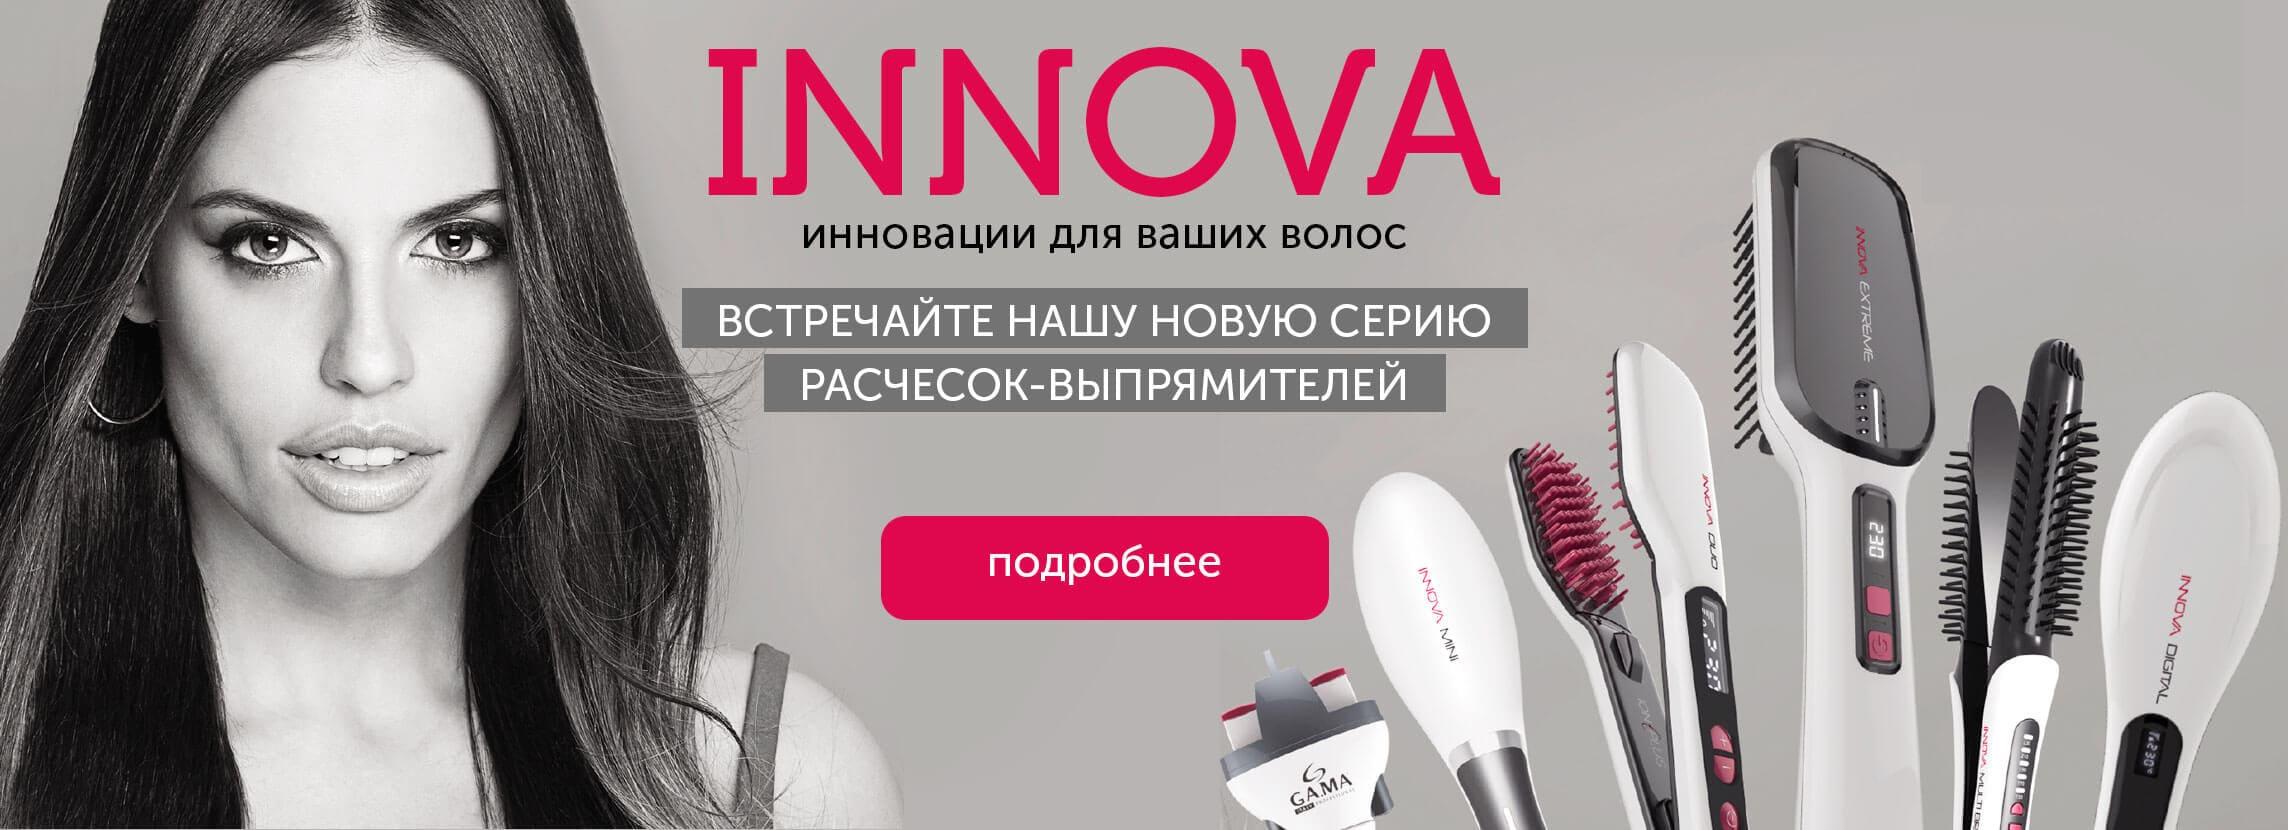 1511794695_0_innova_homepage-2288x830.jpg